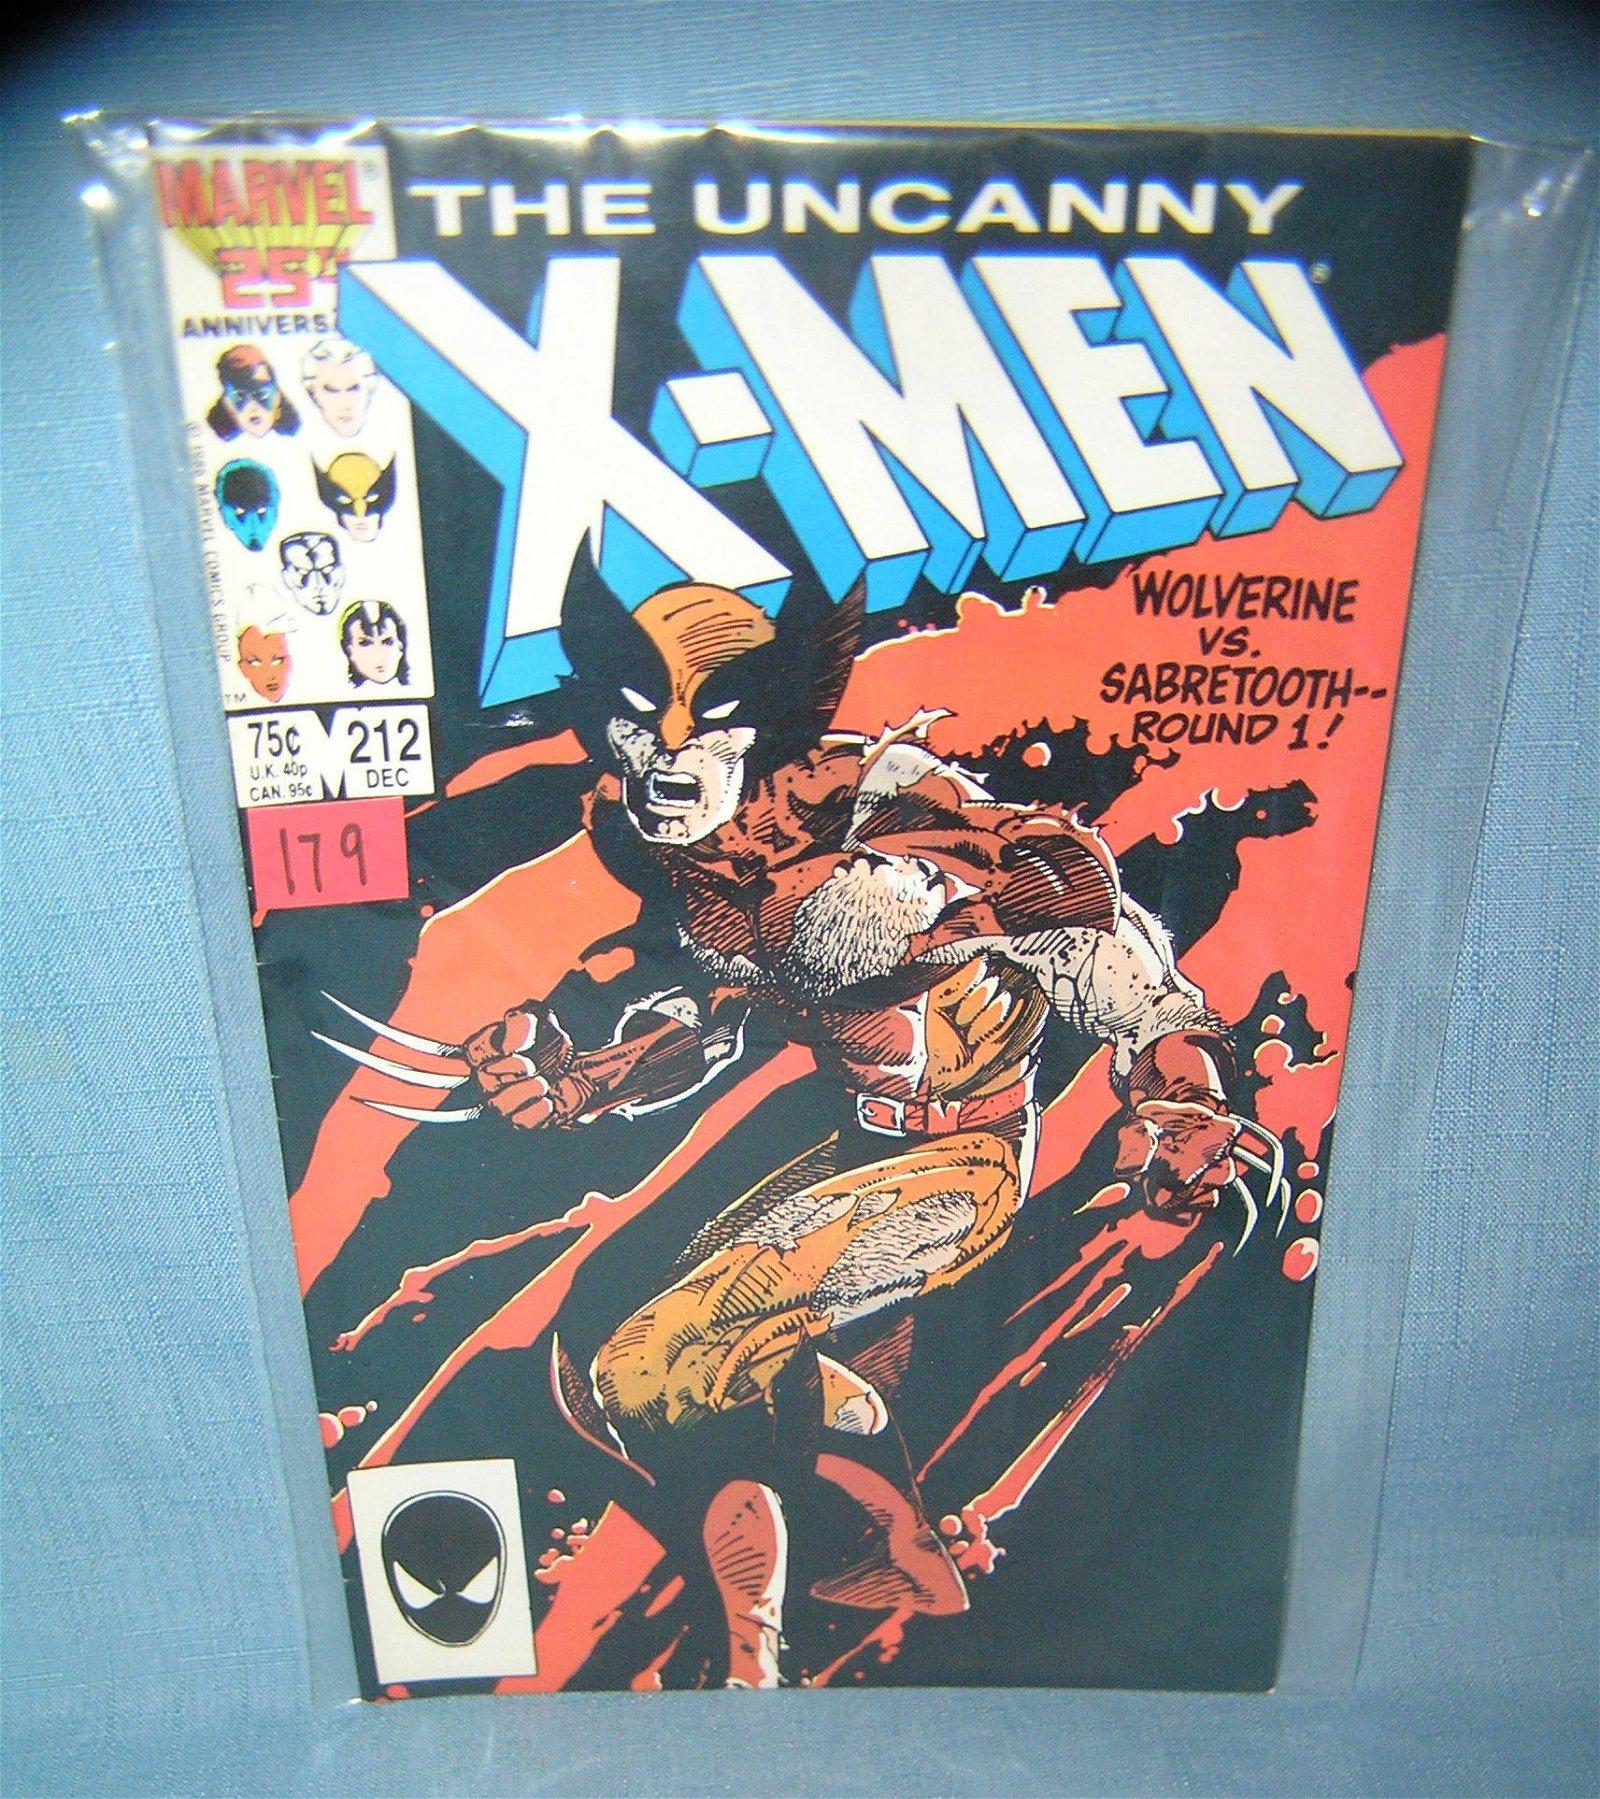 Xmen comic book featuring Wolverine VS Sabertooth